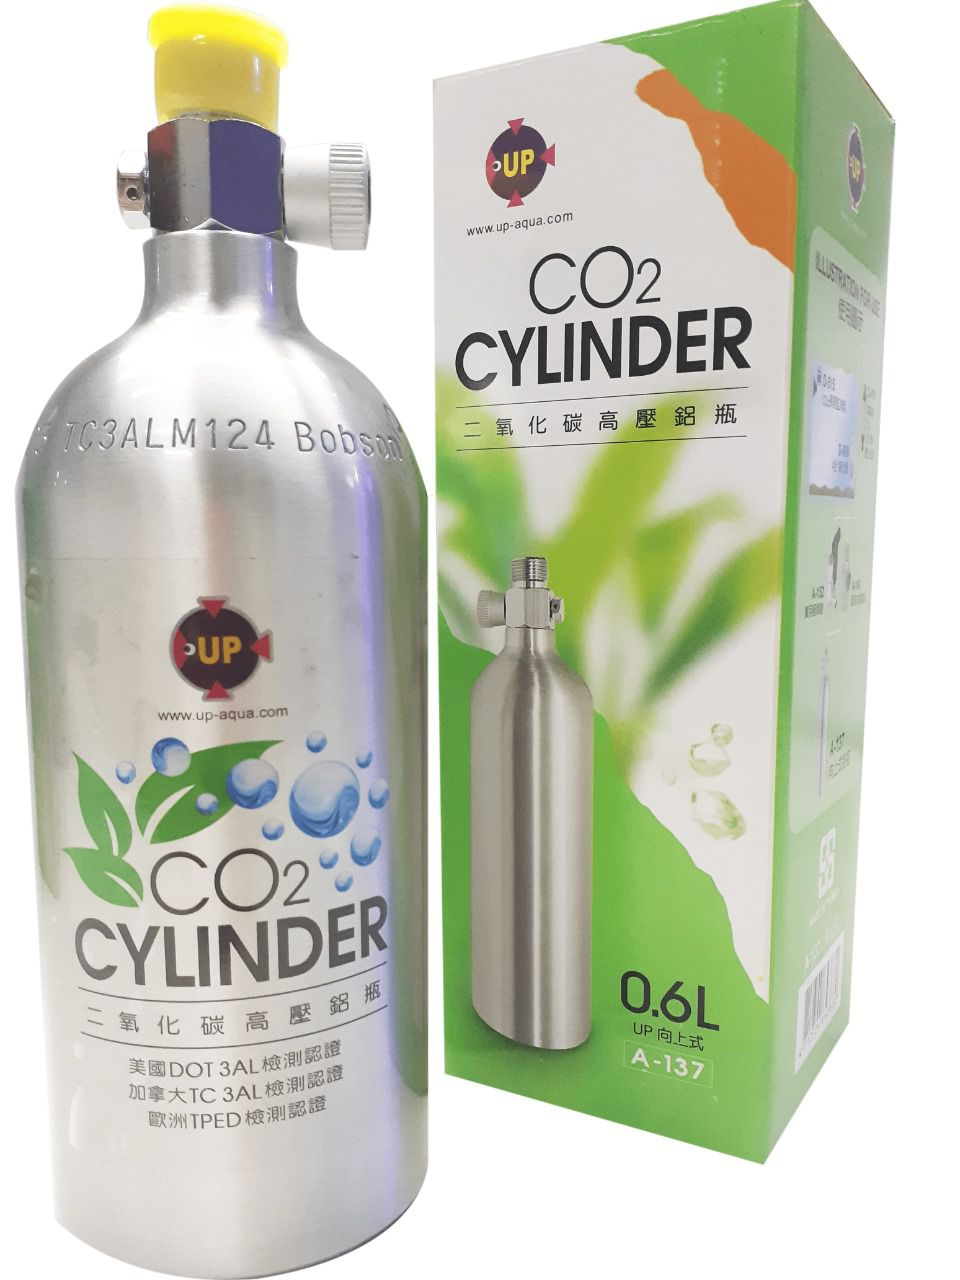 CILINDRO CO2 -,600L ALUMÍNIO RECARREGÁVEL A-137